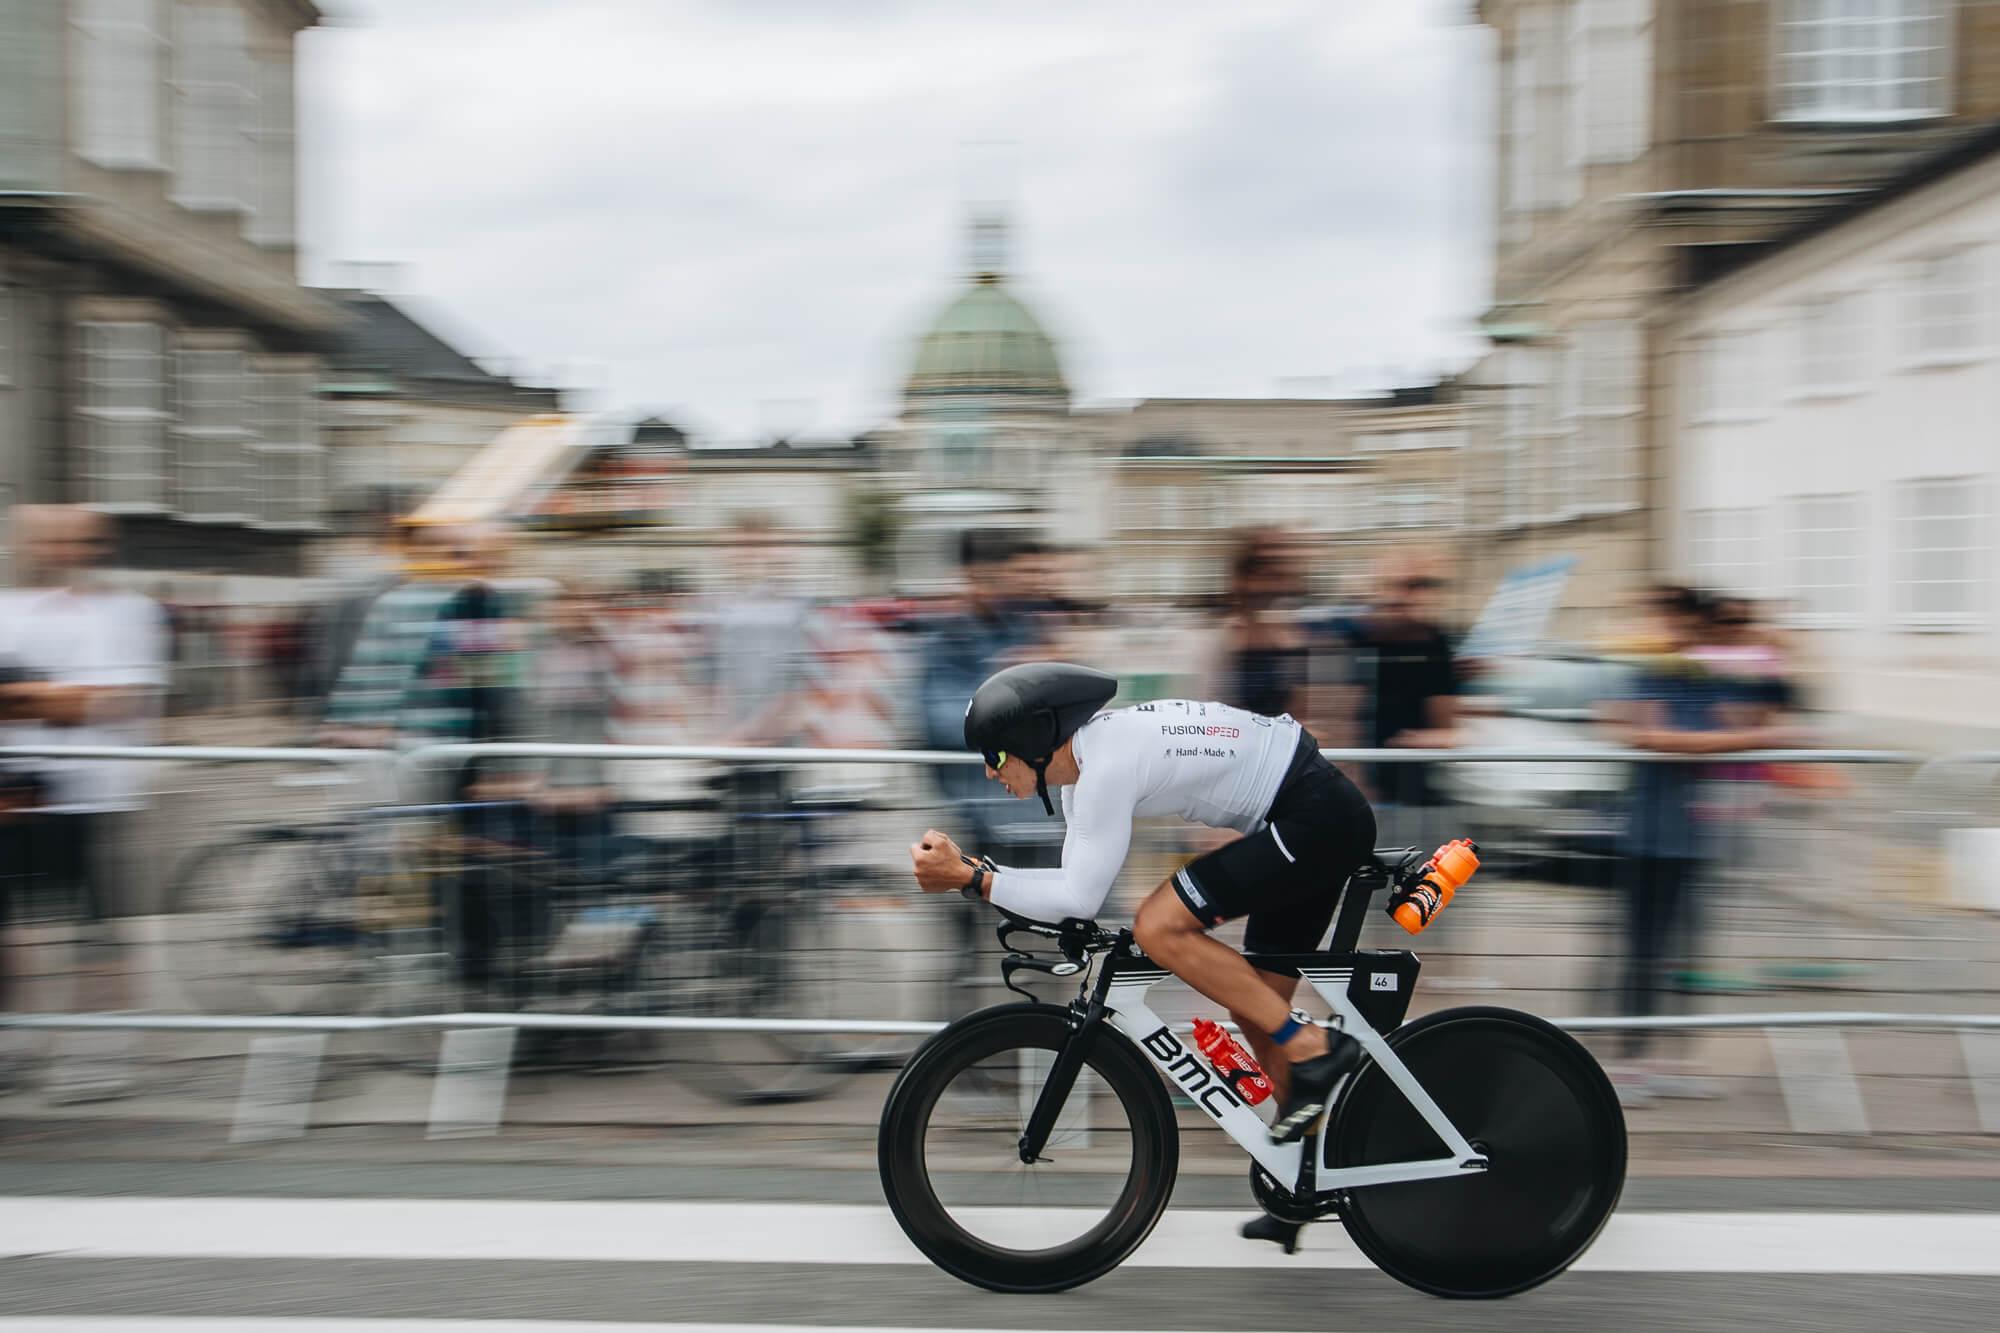 Man racing very fast on a bike past a big crowd in Copenhagen